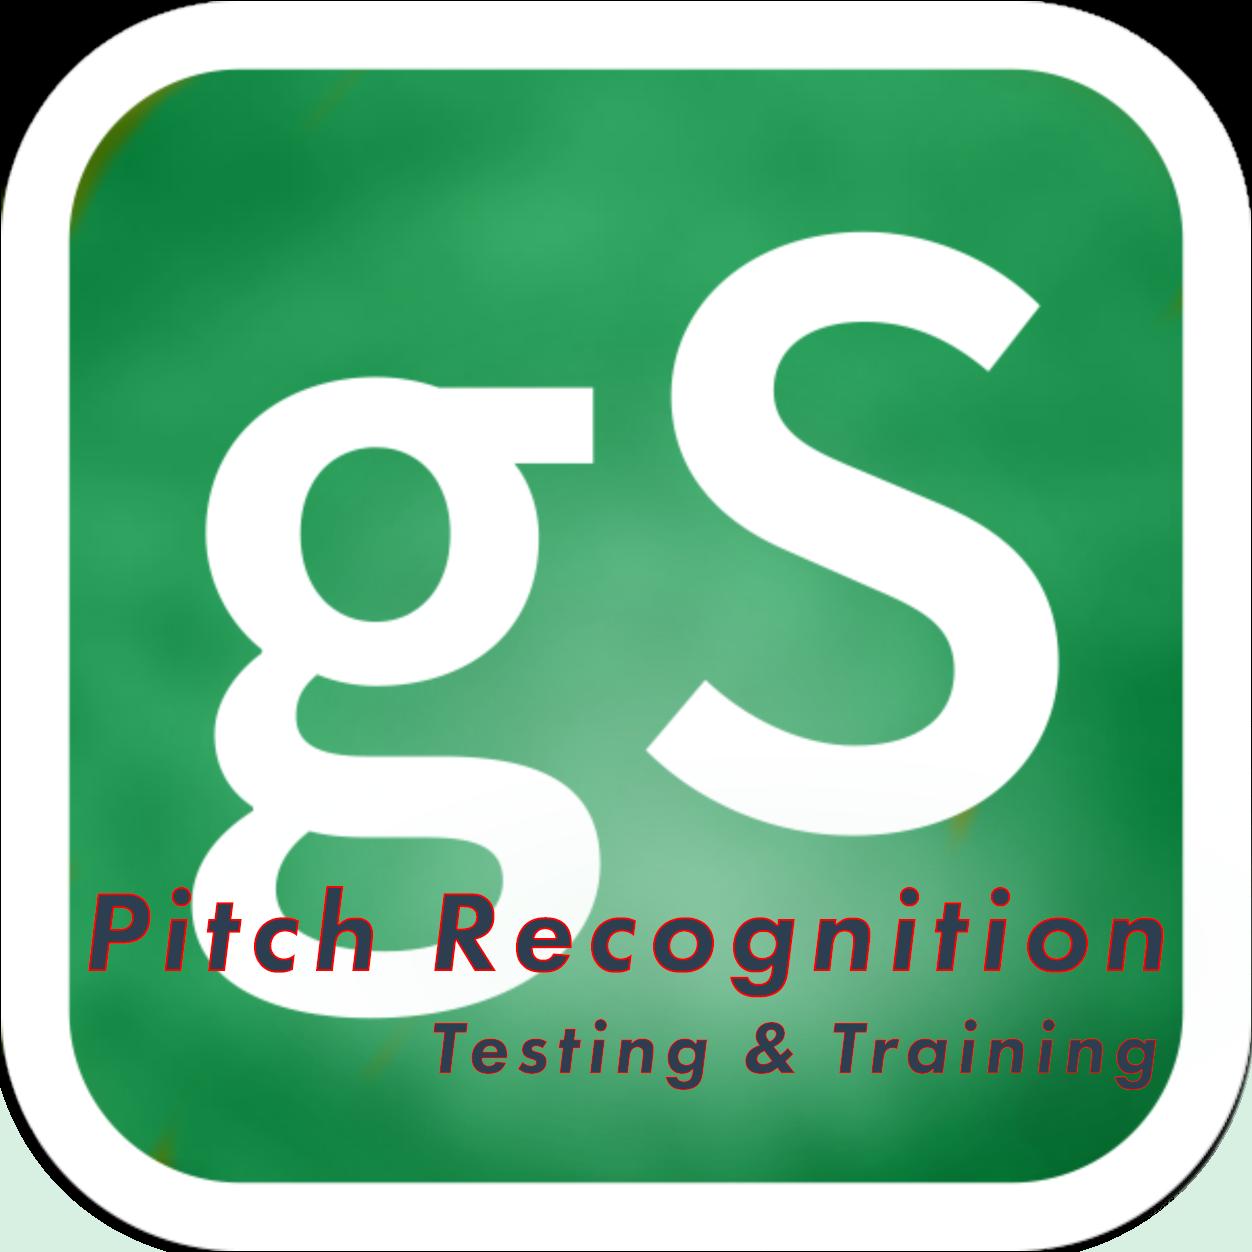 gs-gameSense logo Pitch Rec testing and training_2-1-18.png